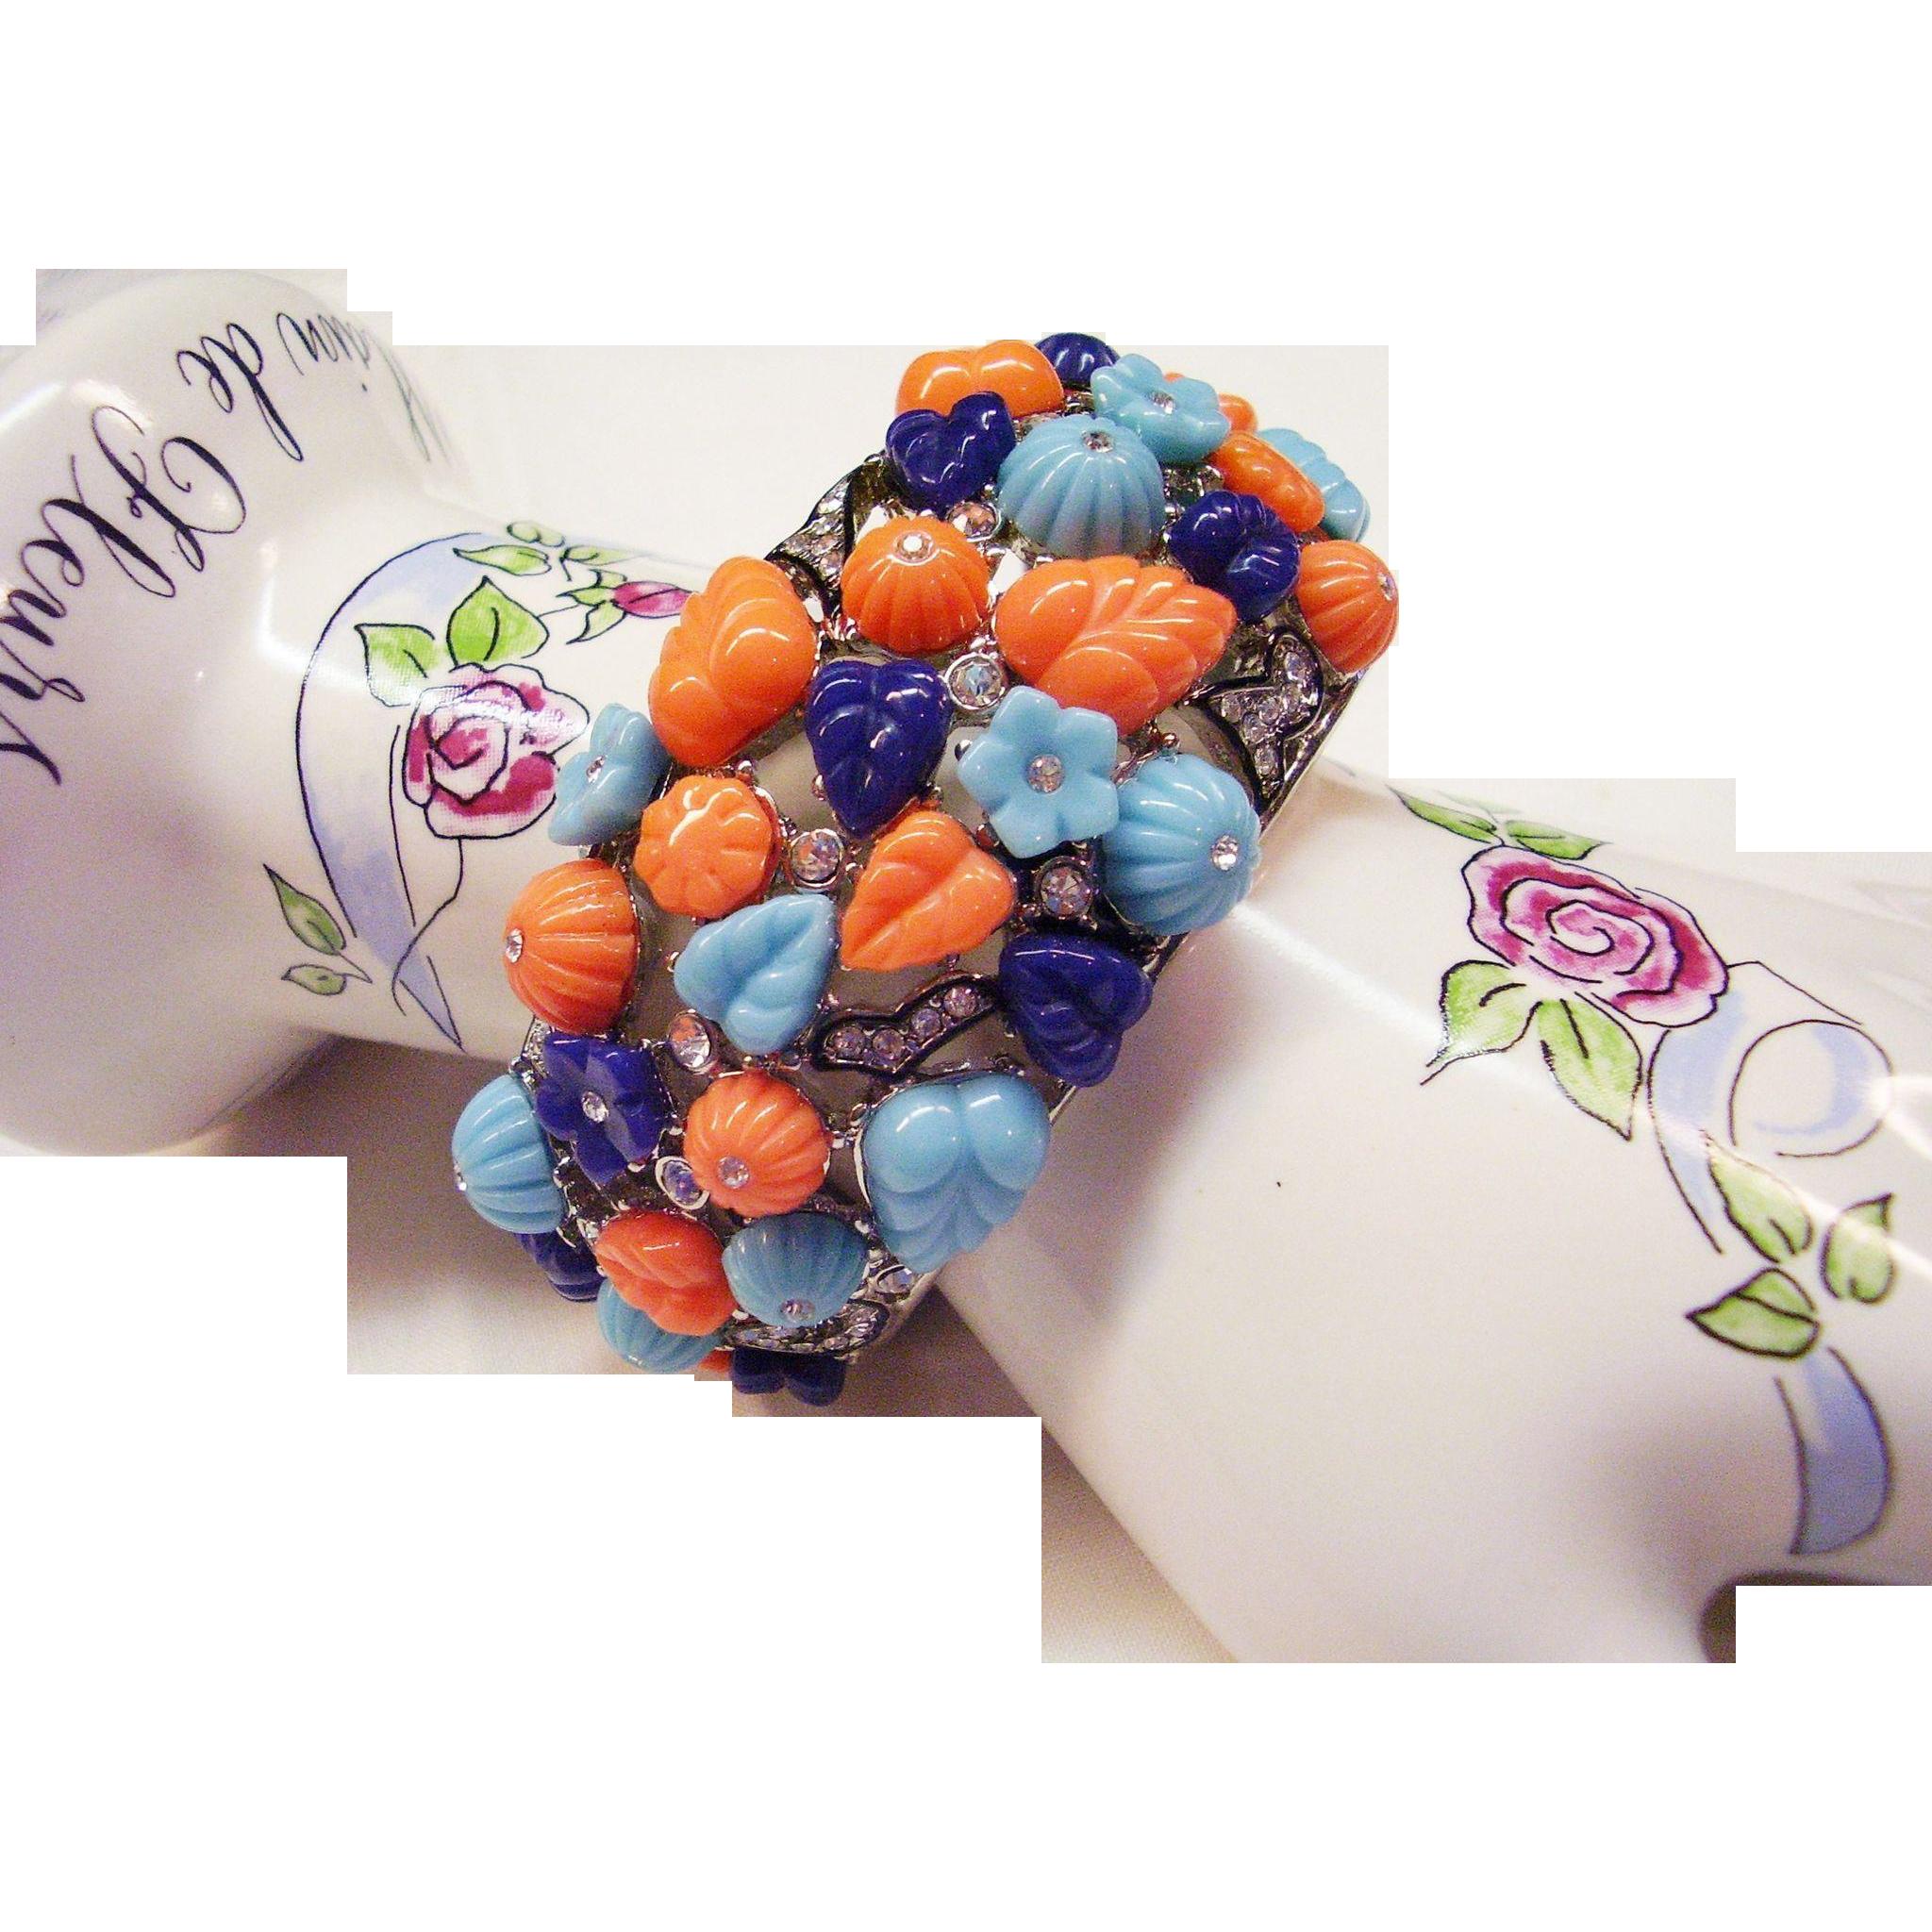 Kenneth Jay Lane Kjl Bracelet Tutti Frutti Fruit Salad Cuff Faux Turquoise C Lapis With Rhinestones 1 2 Wide Couture